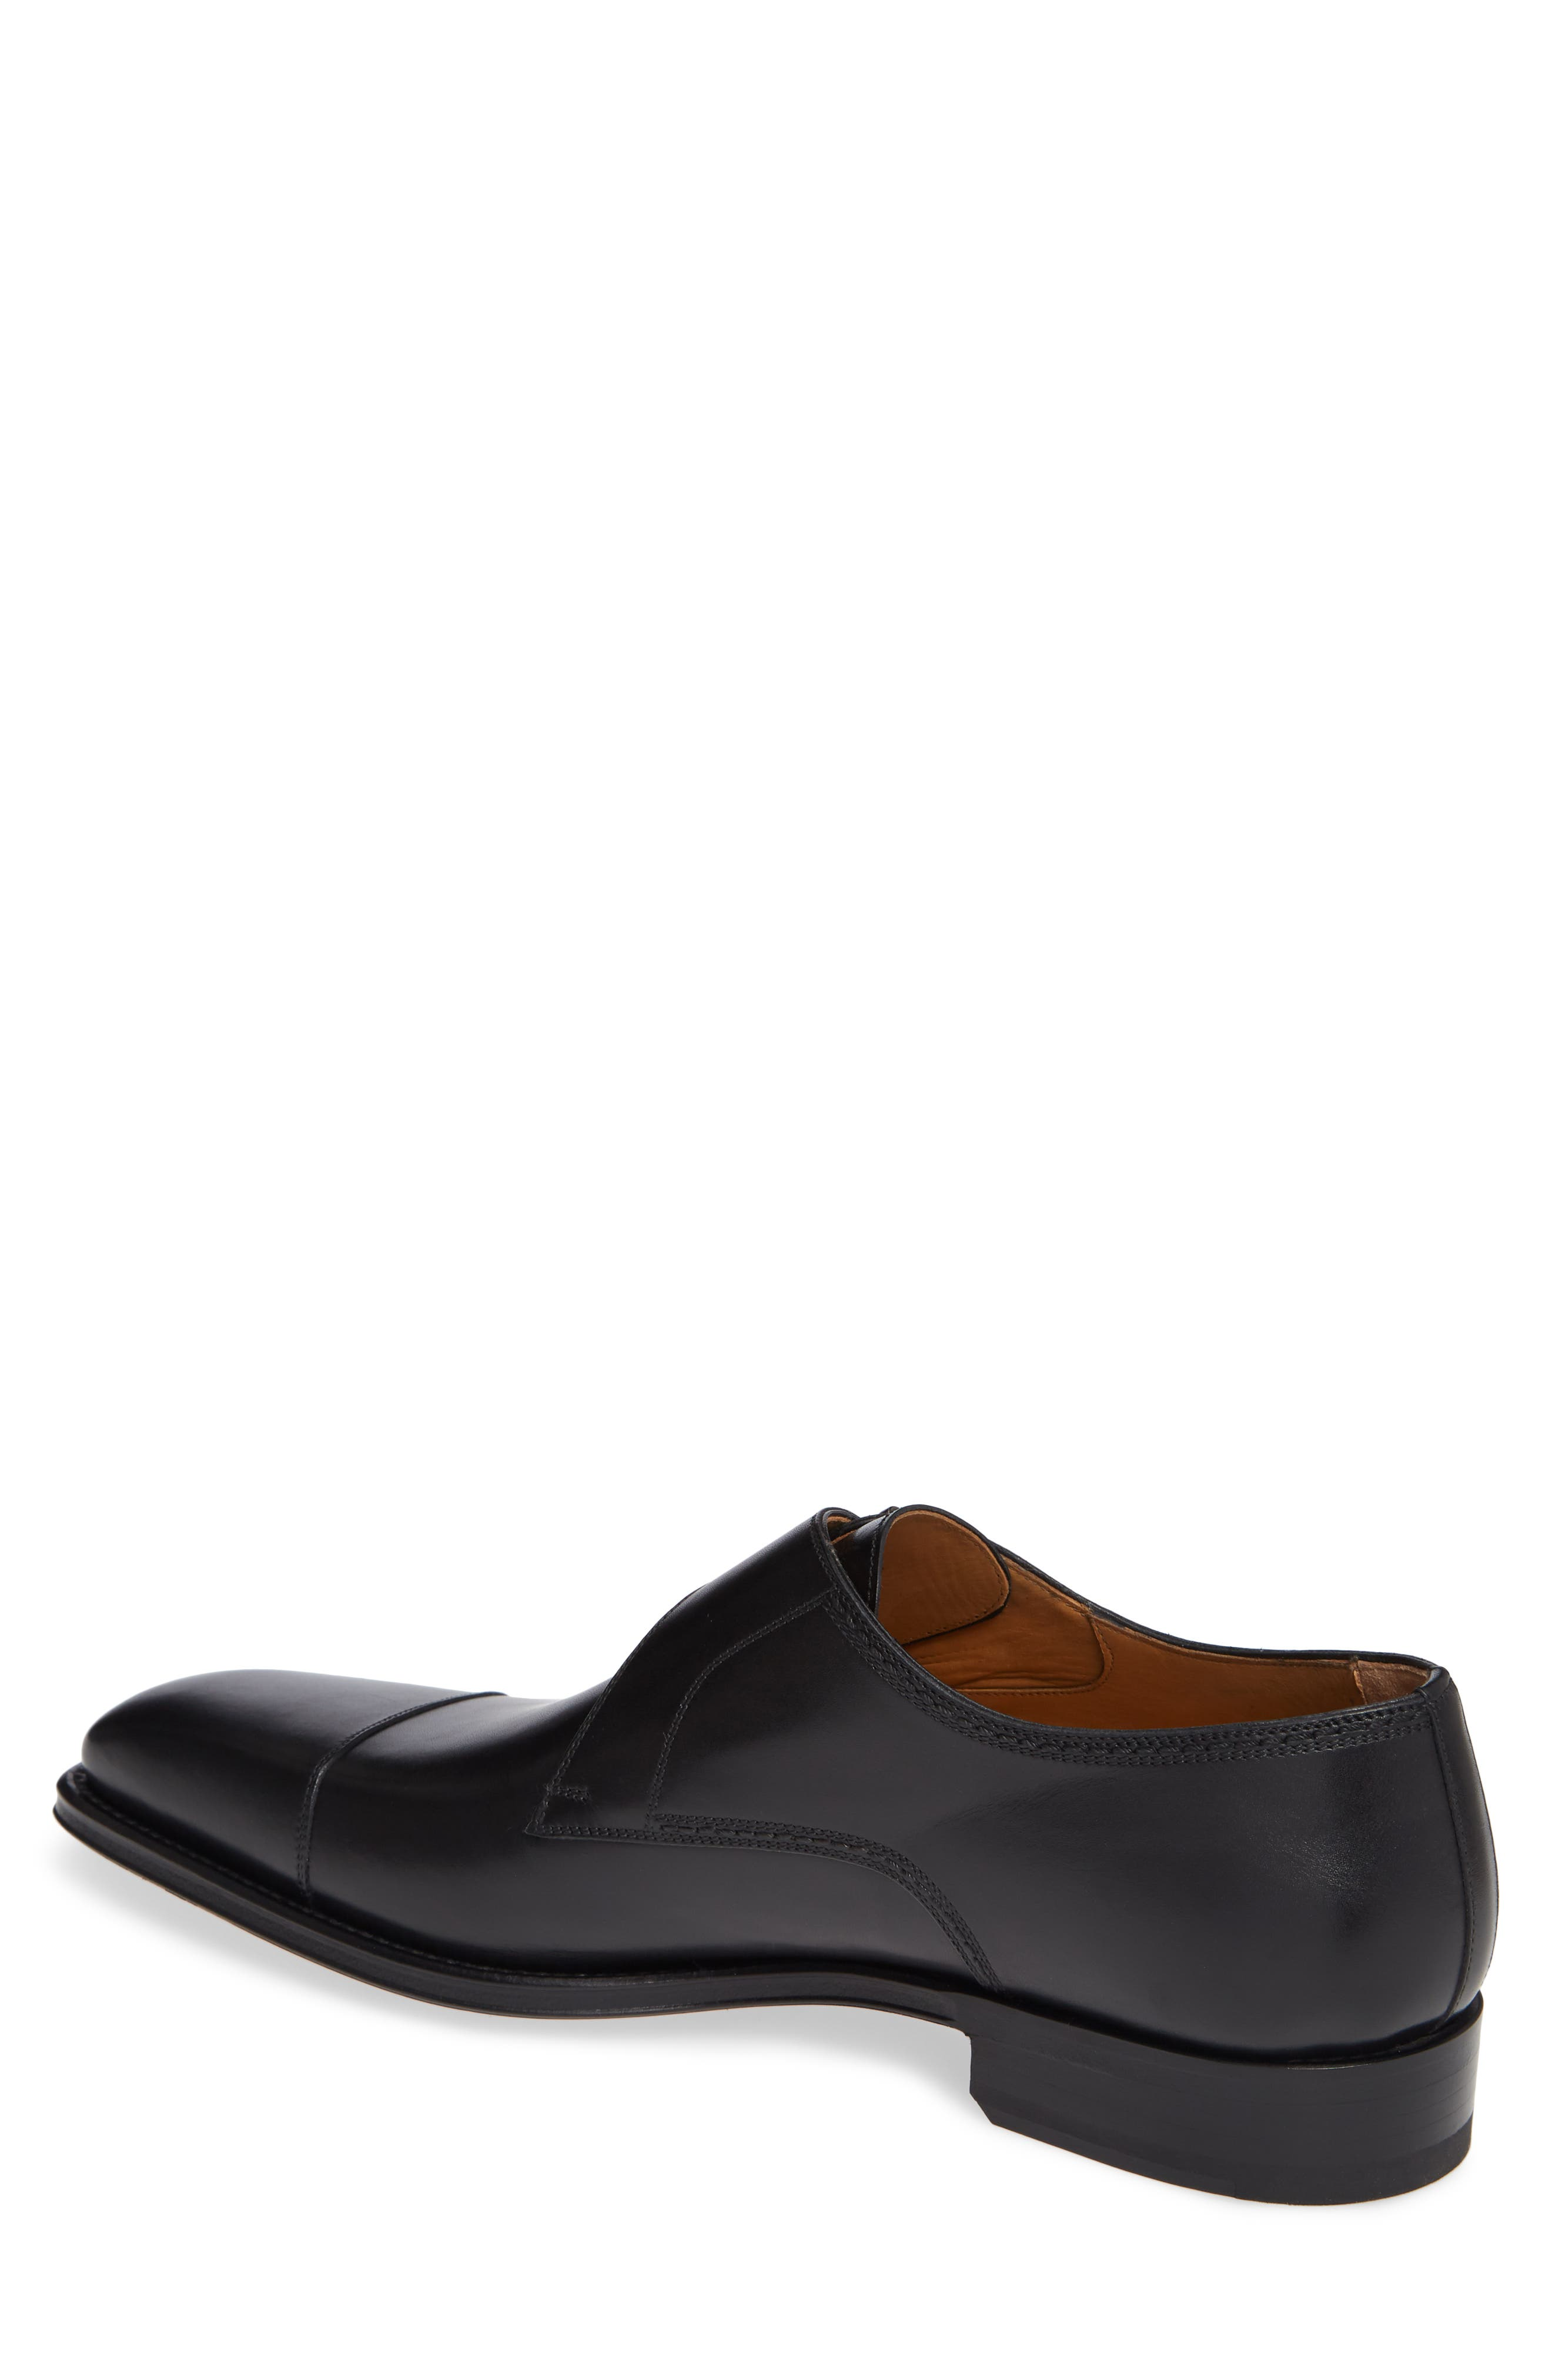 Lennon Monk Strap Shoe,                             Alternate thumbnail 2, color,                             BLACK LEATHER